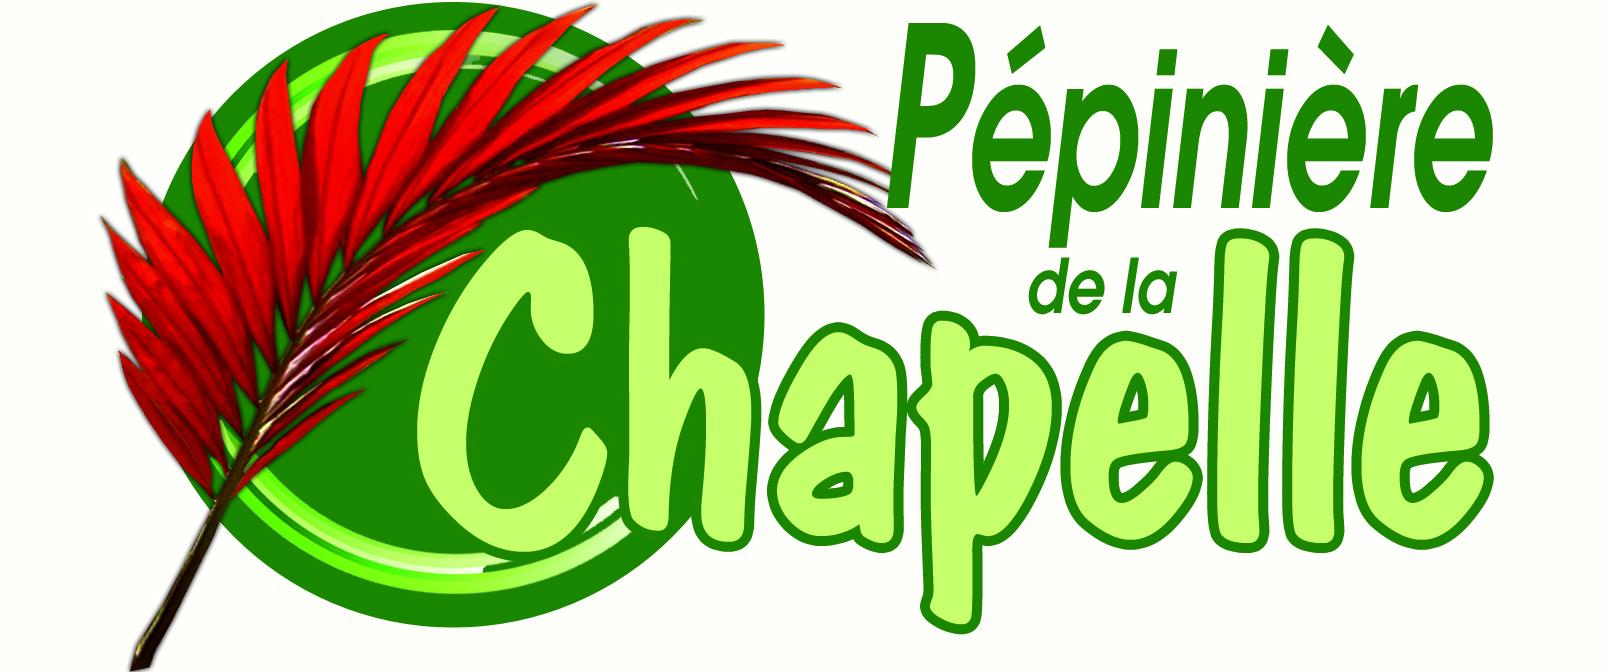 Logo_pepiniere_de_la_Chapelle